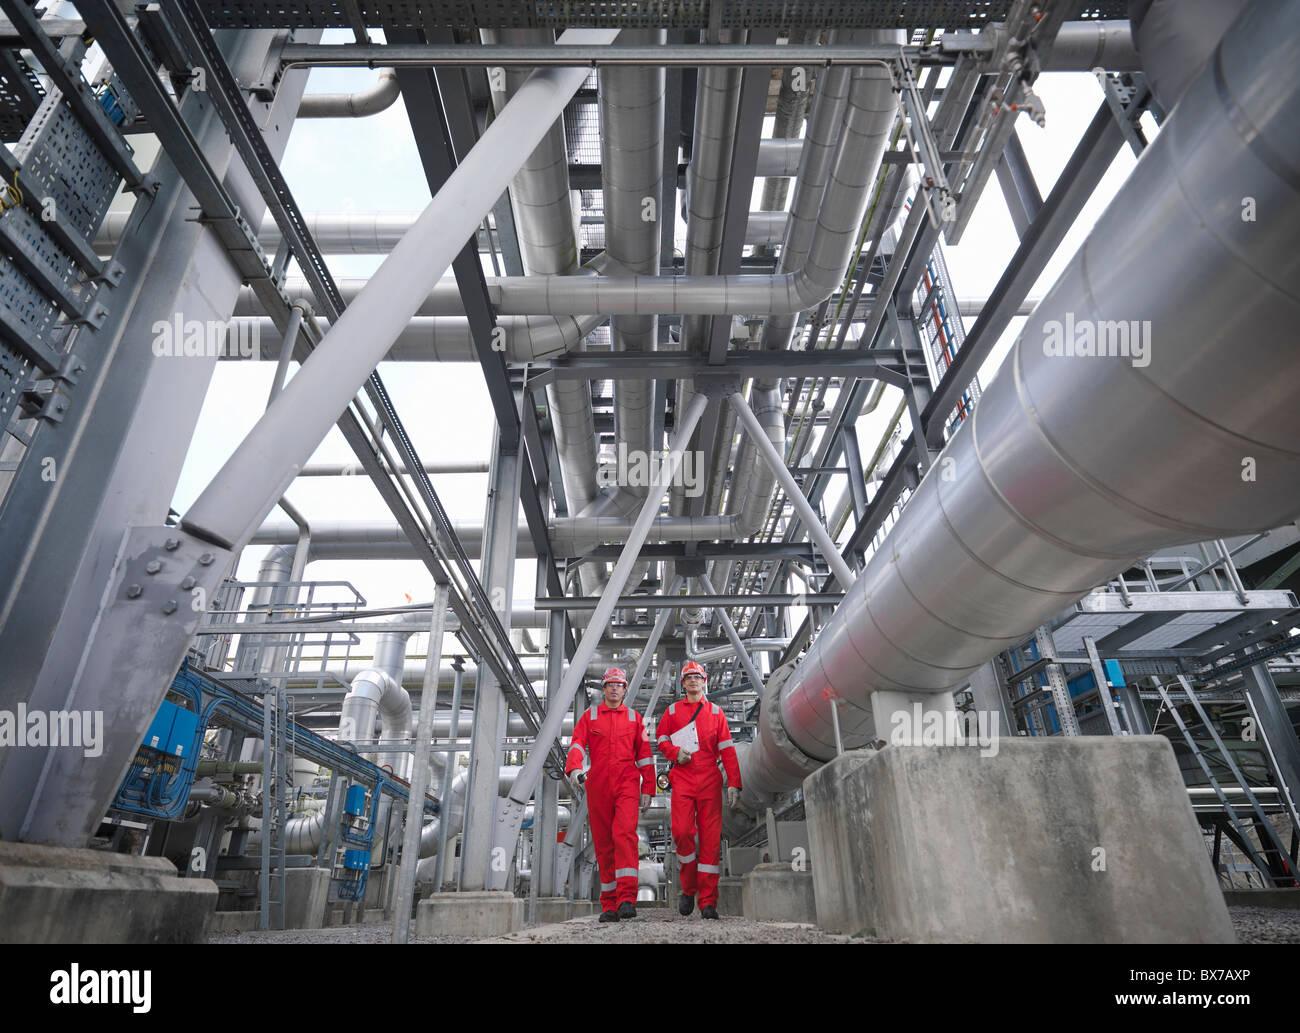 Workers in underground gas storage plant - Stock Image